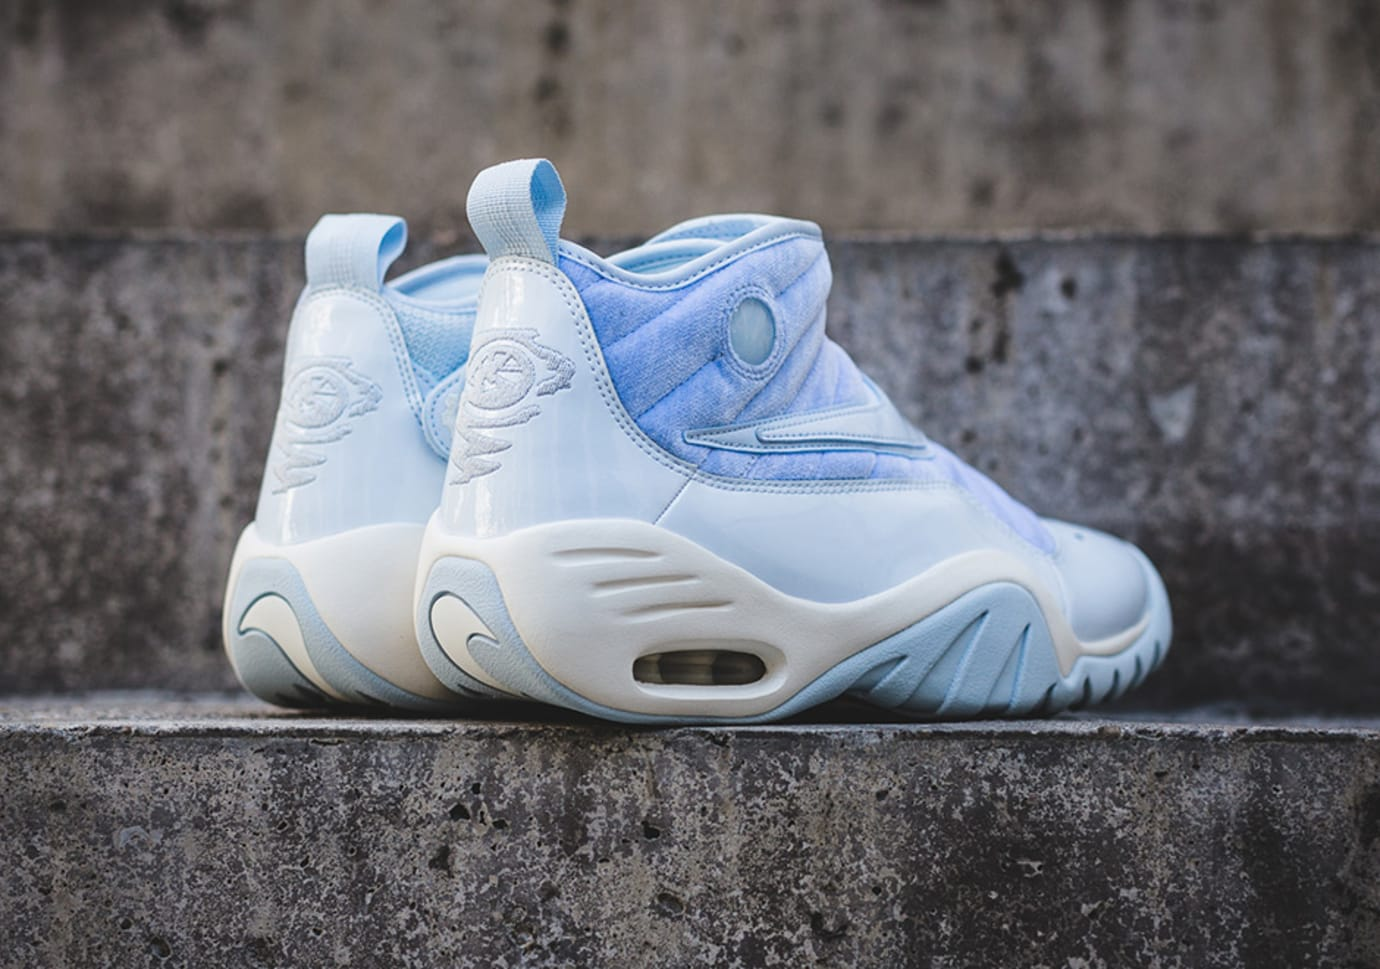 Nike Air Shake Ndestrukt Easter Blue Release Date Heel 943020-400